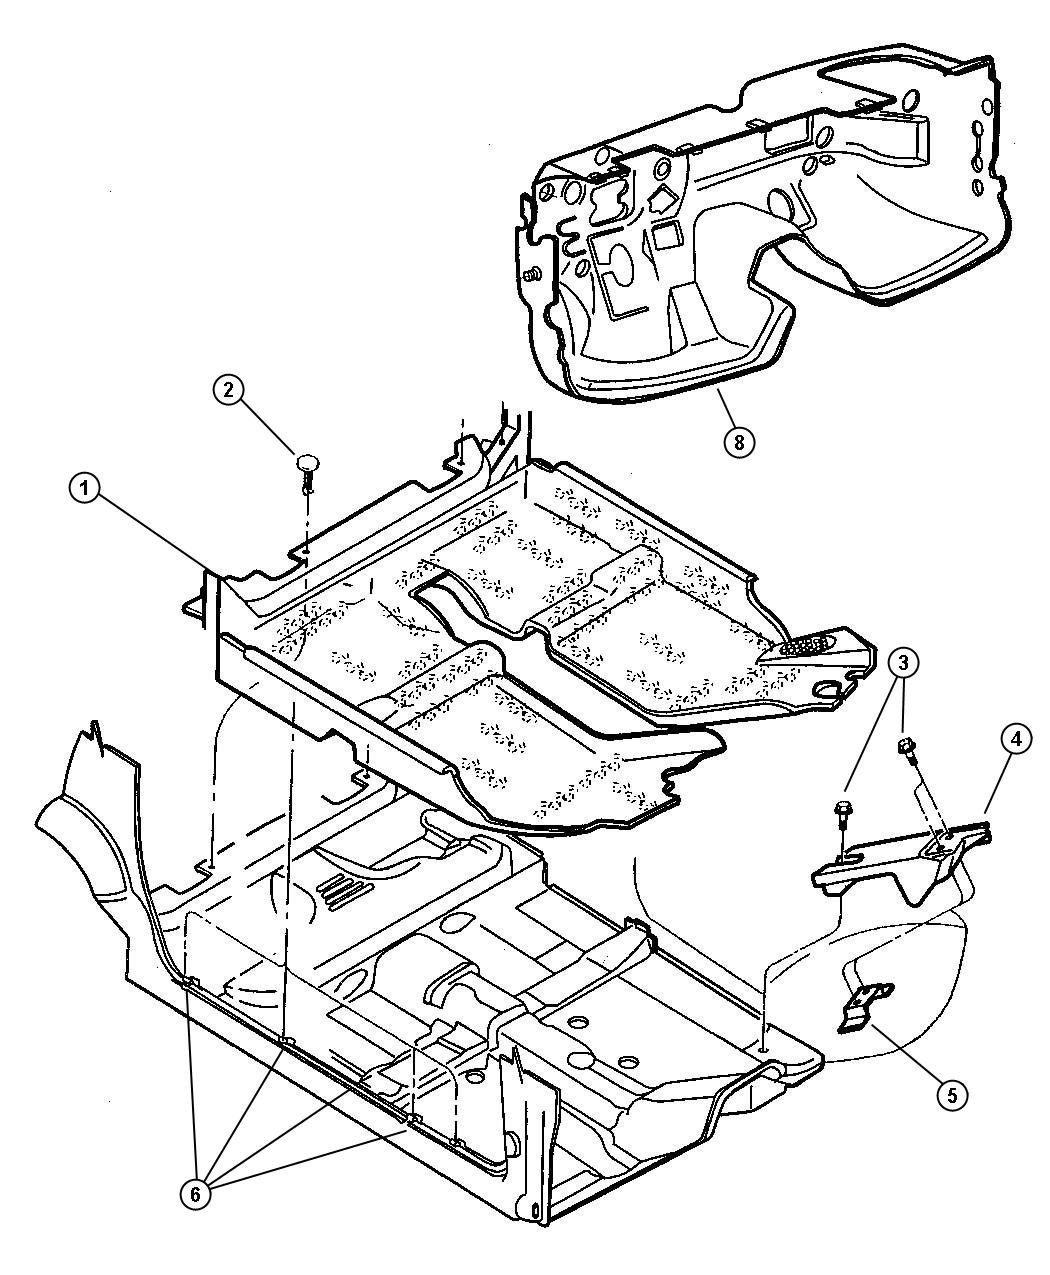 2000 Dodge Grand Caravan Clip, nameplate, nut. Dash panel